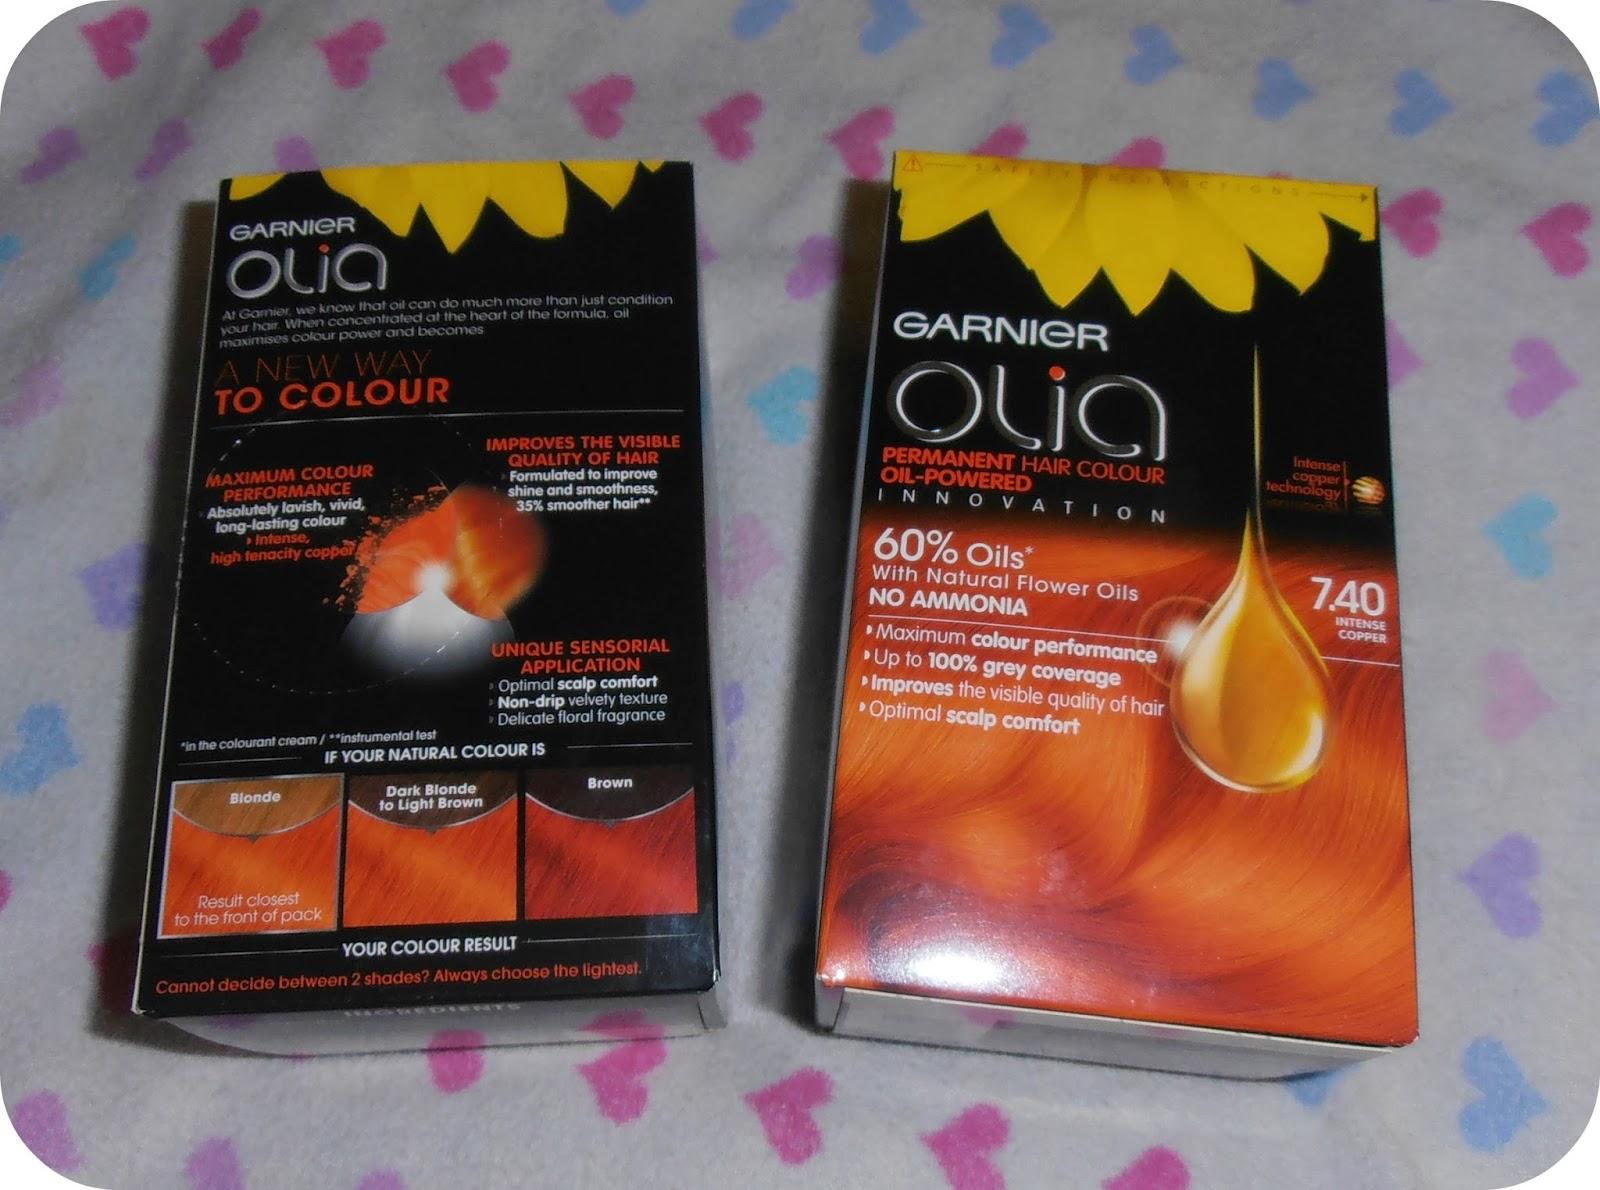 Shell Senseless Garnier Olia Permanent Hair Colour